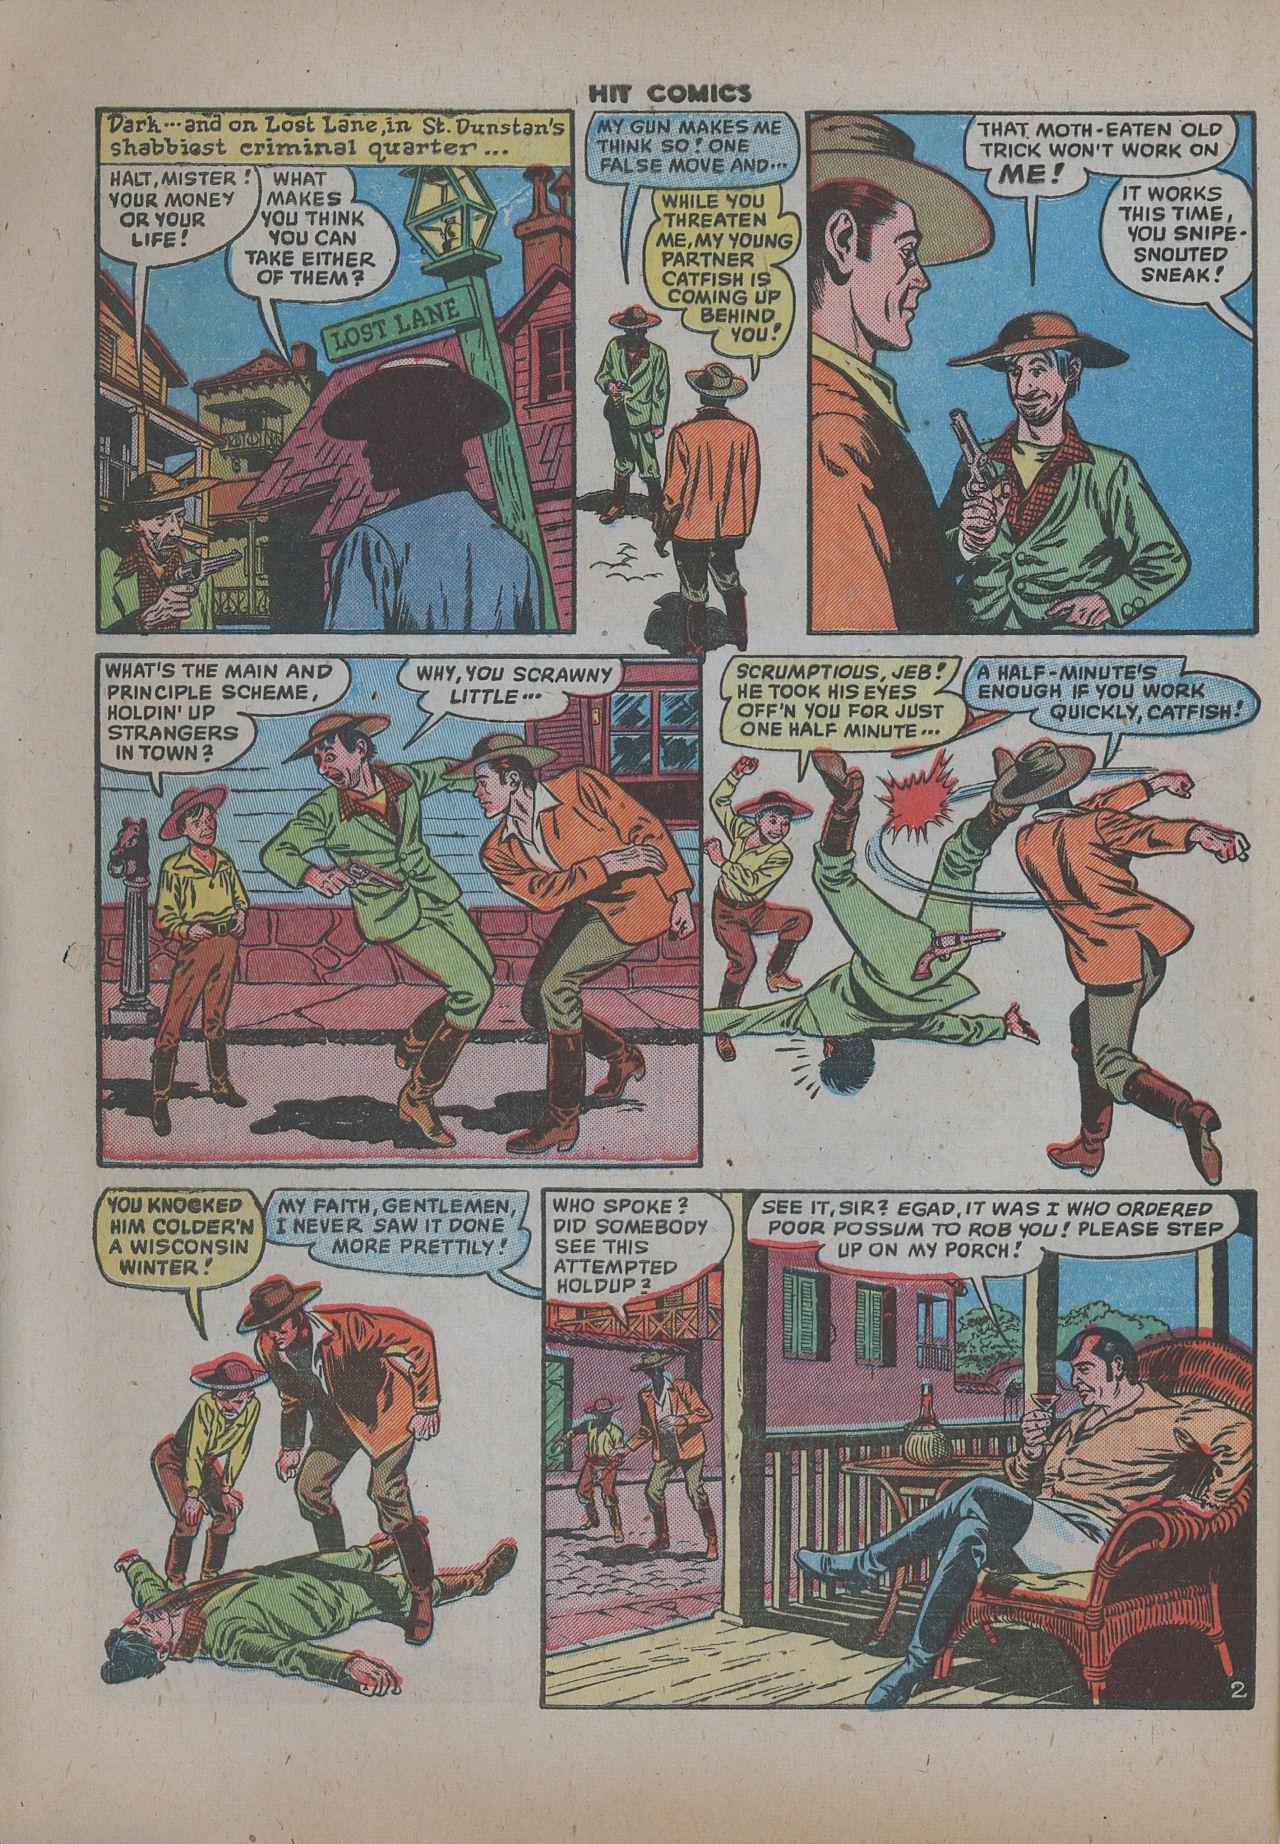 Read online Hit Comics comic -  Issue #62 - 5